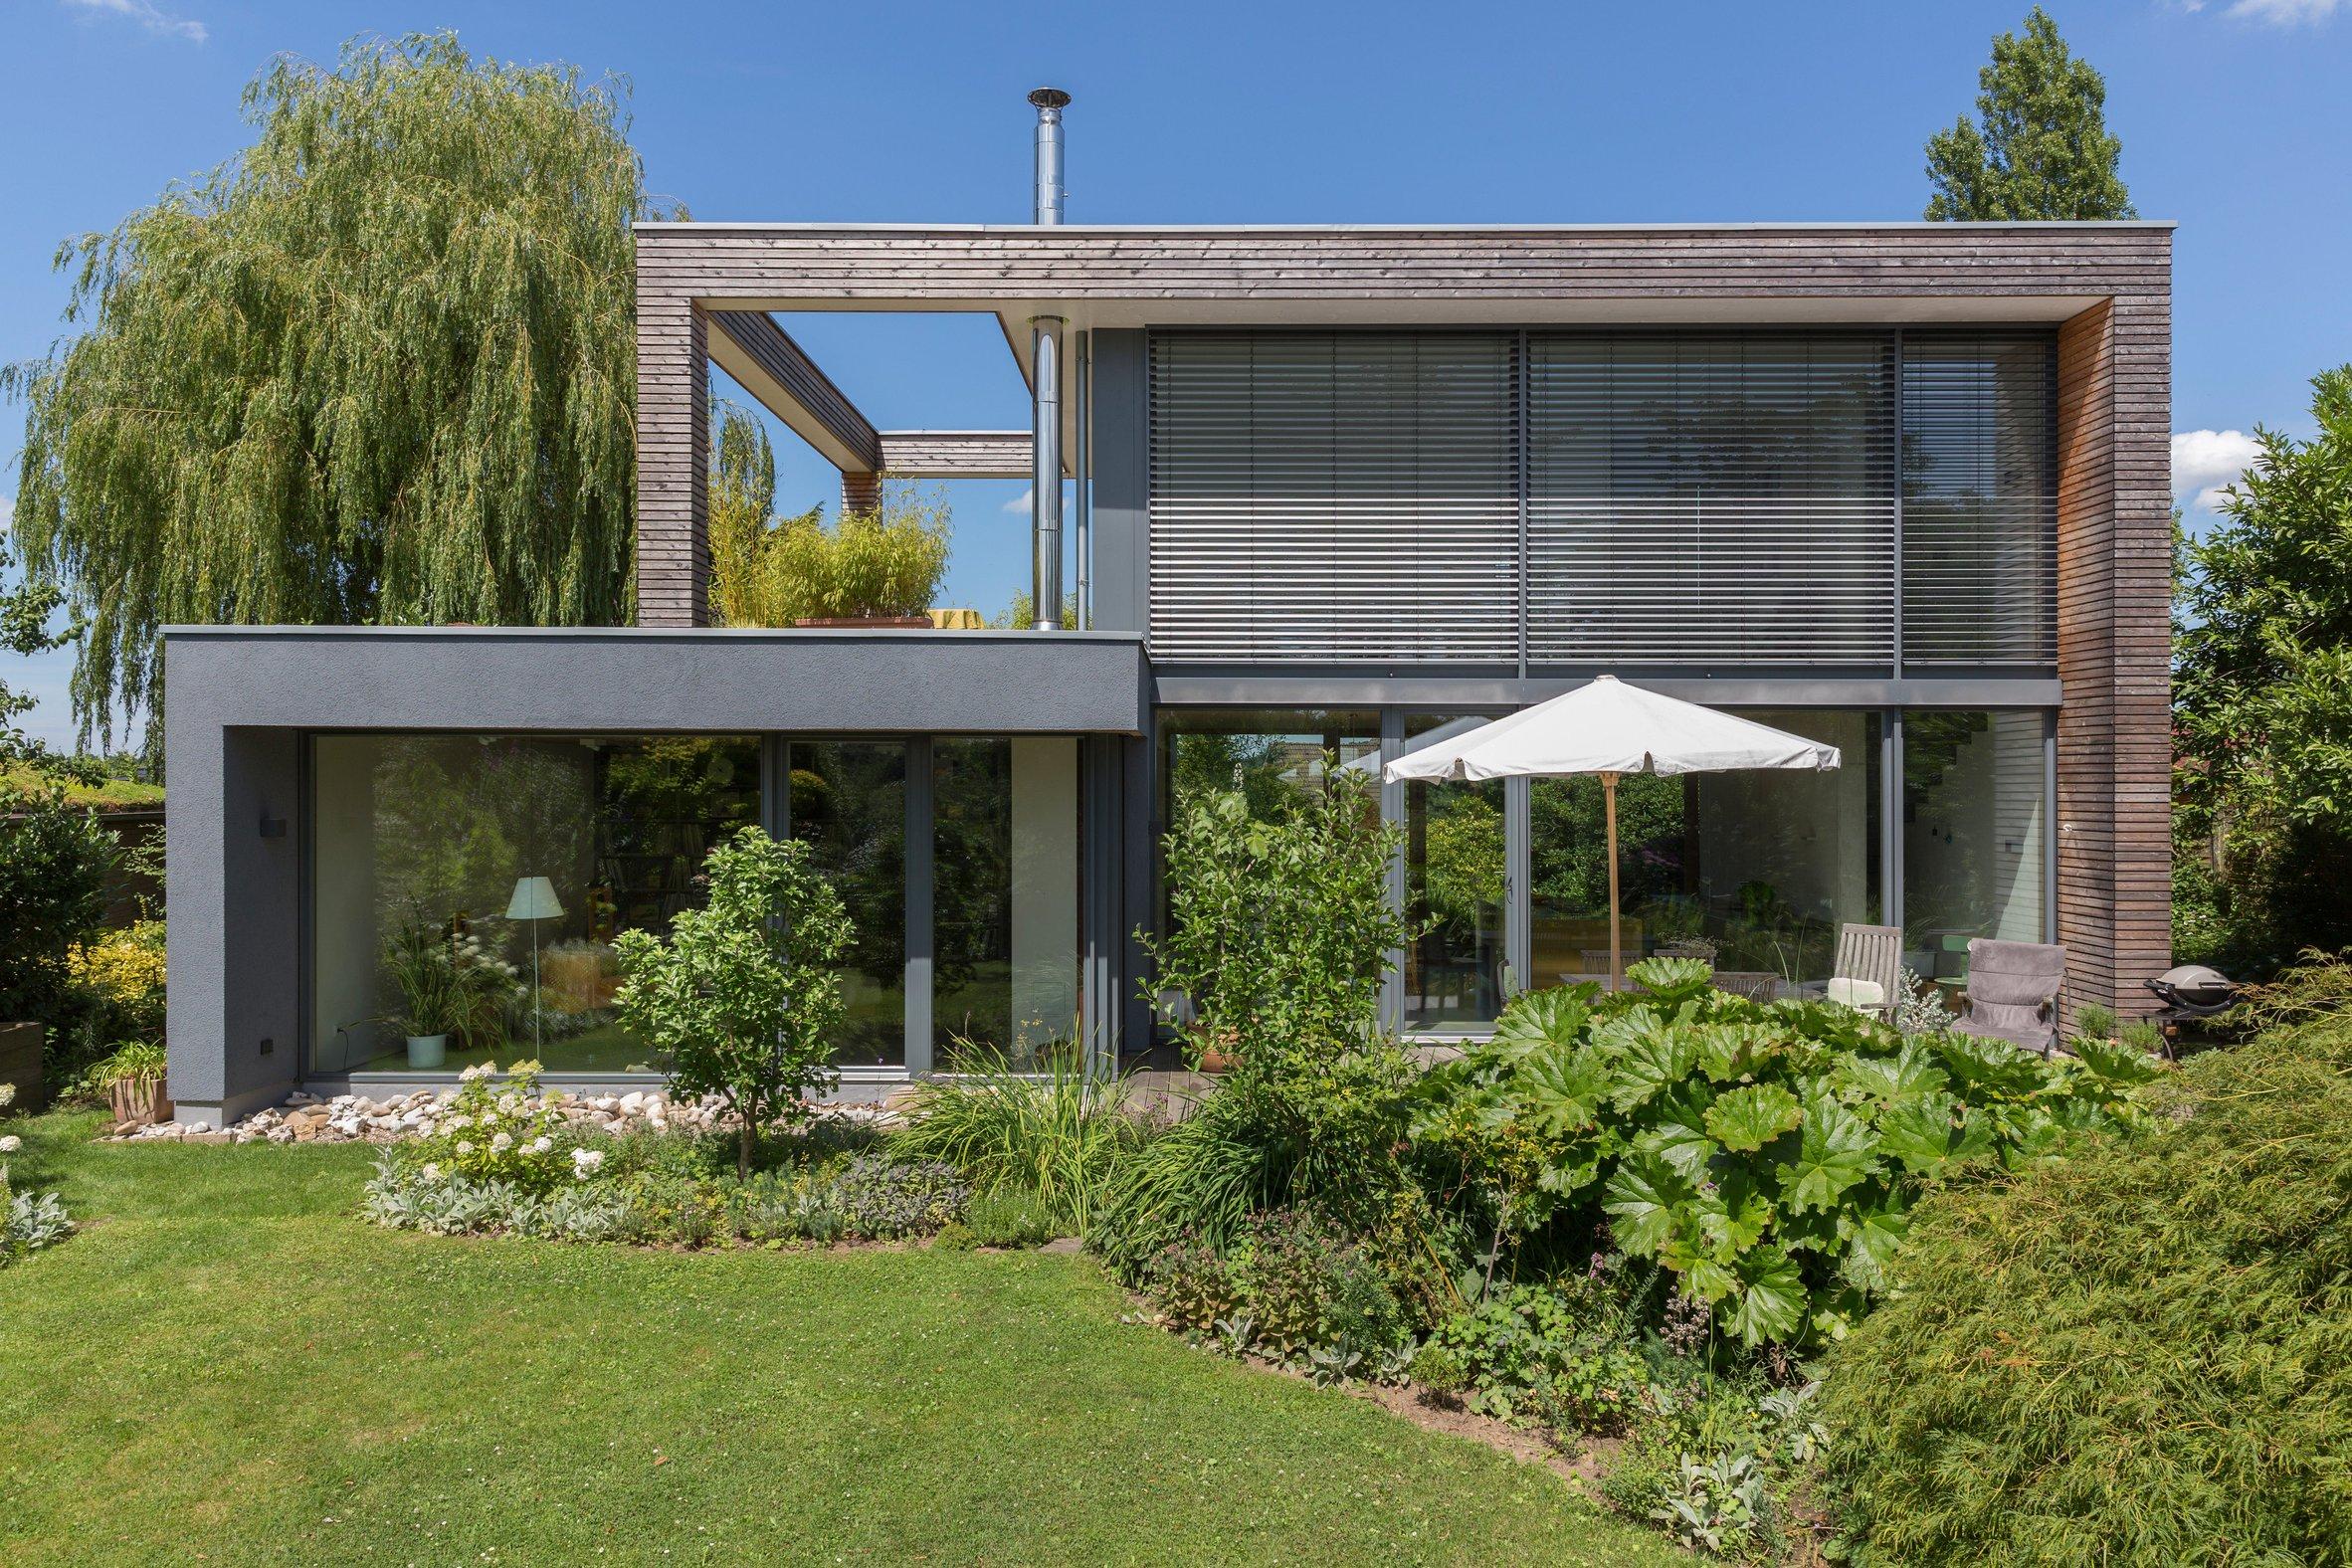 Einfamilienhaus Peters Garten Natur